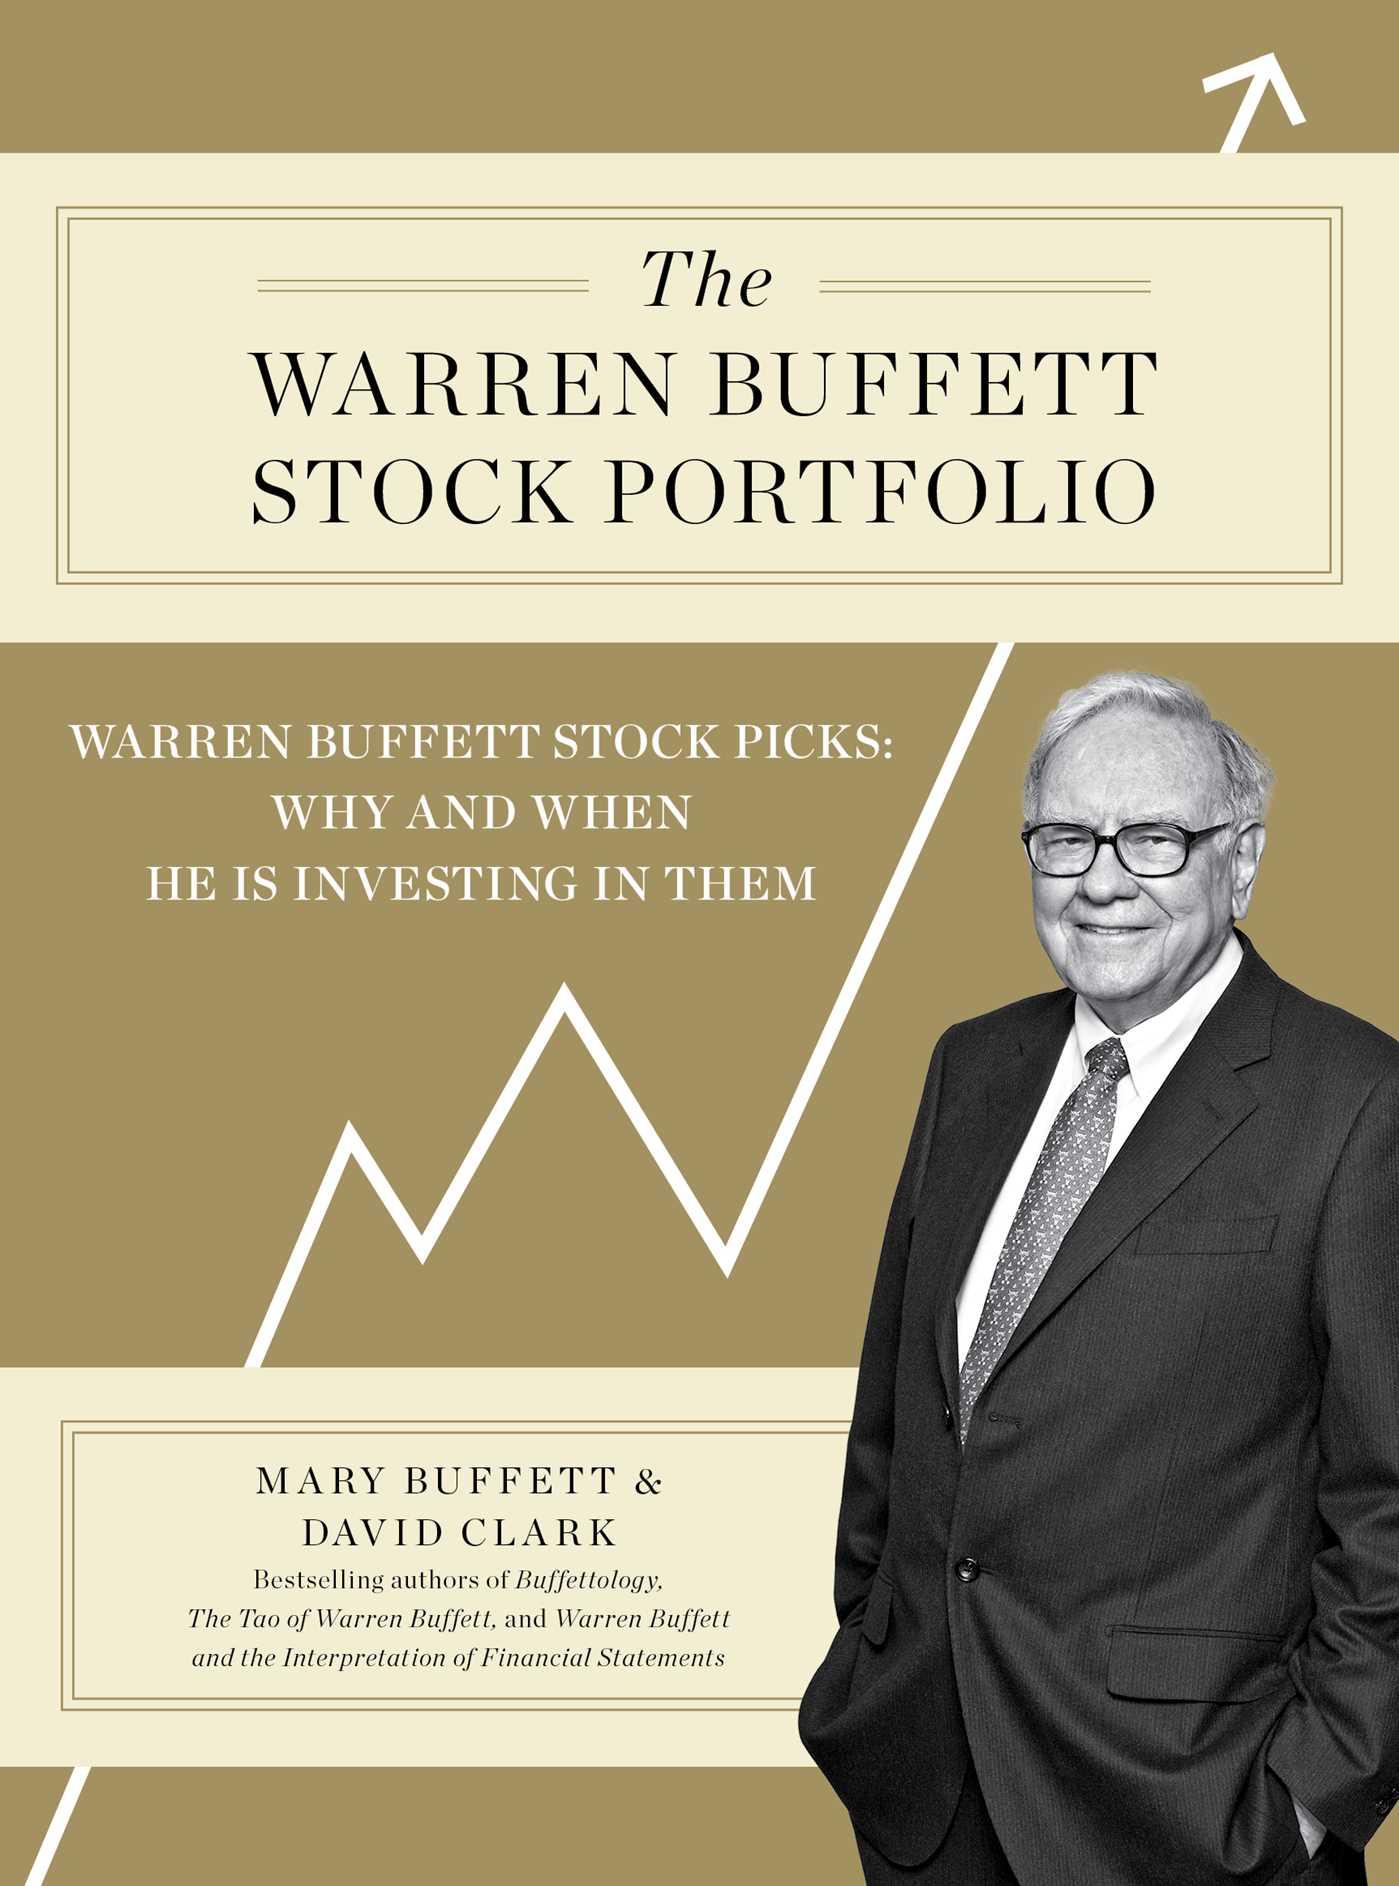 The warren buffett stock portfolio 9781451606485 hr